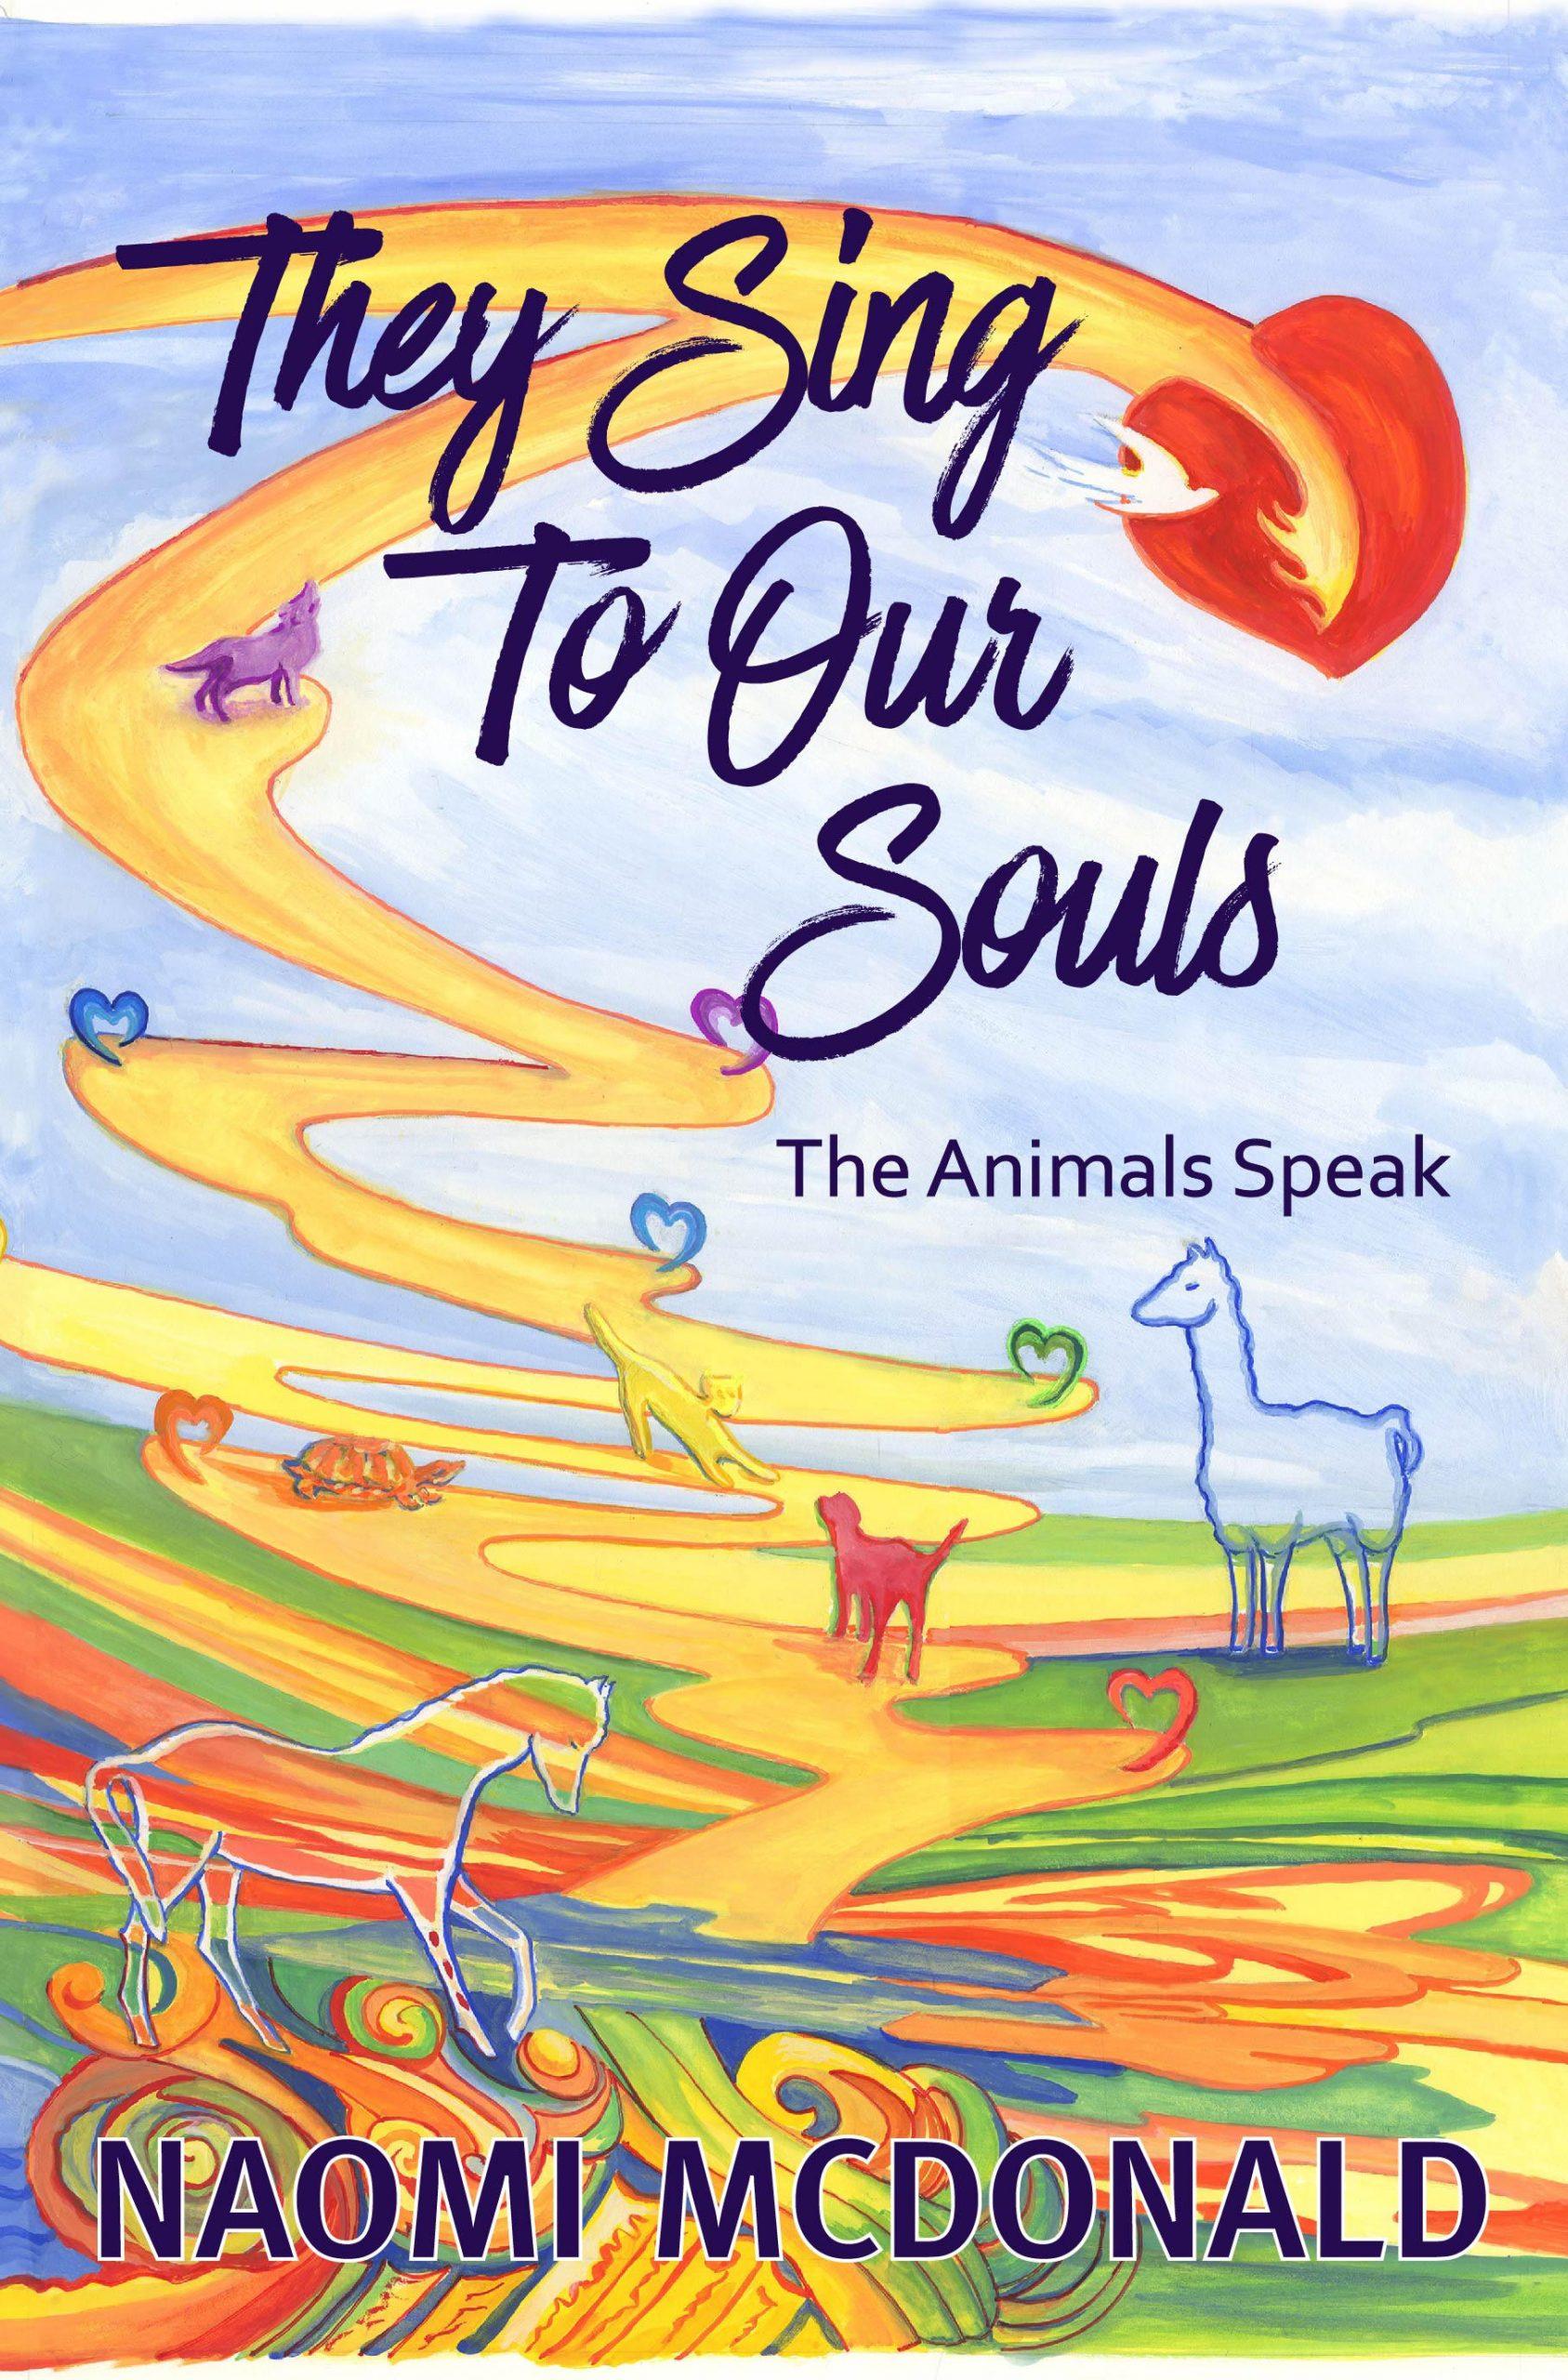 Voices of the Heart author Linda Pestana